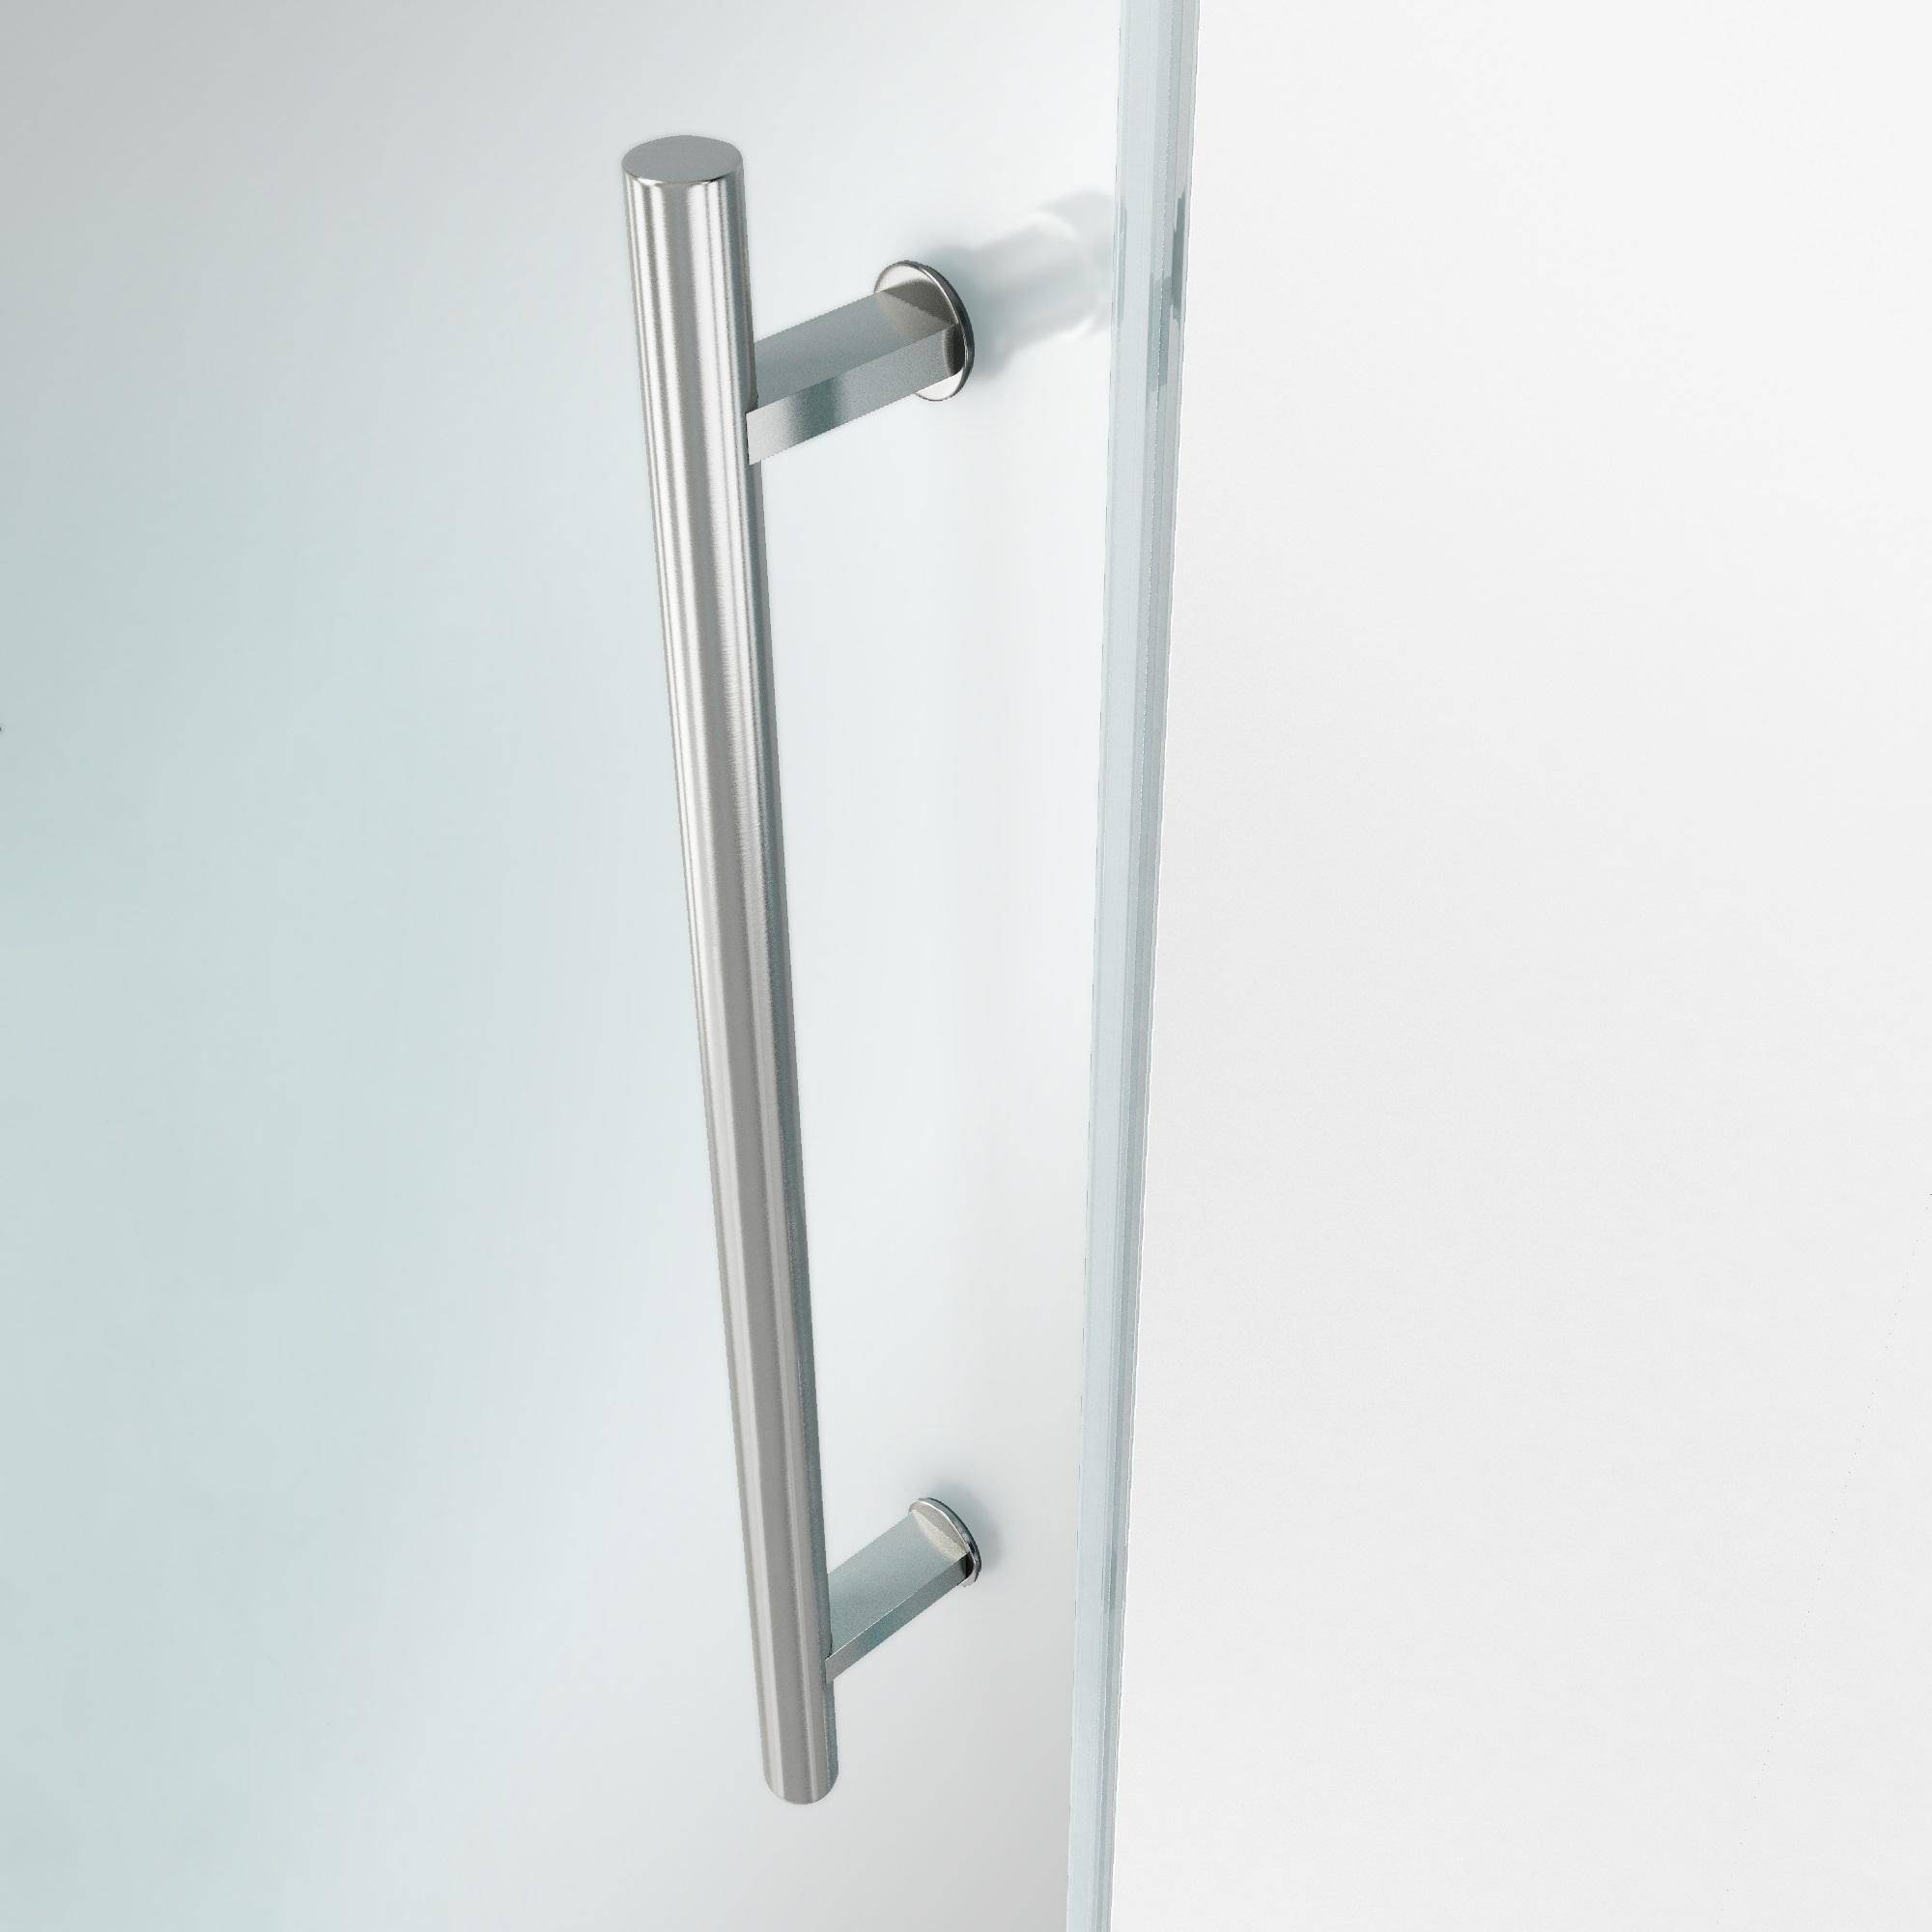 door showers for raleigh enclosure nc frameless hardware custom handles enclosures pull shower